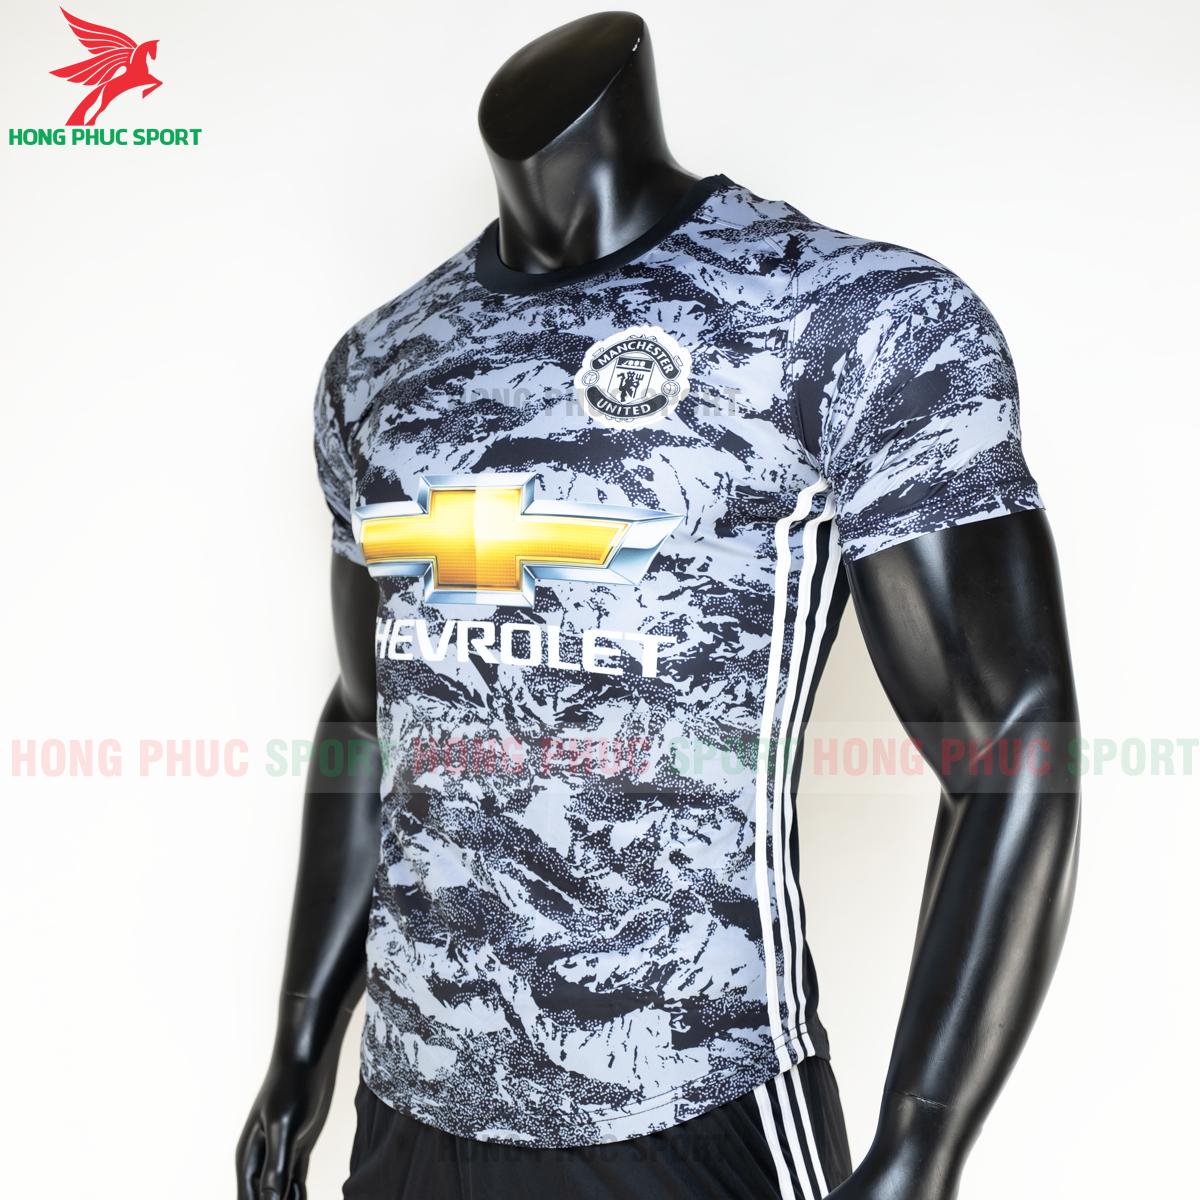 https://cdn.hongphucsport.com/unsafe/s4.shopbay.vn/files/285/ao-da-bong-manchester-united-2020-2021-phien-ban-fan-3-5fe1b75c3db4c.png